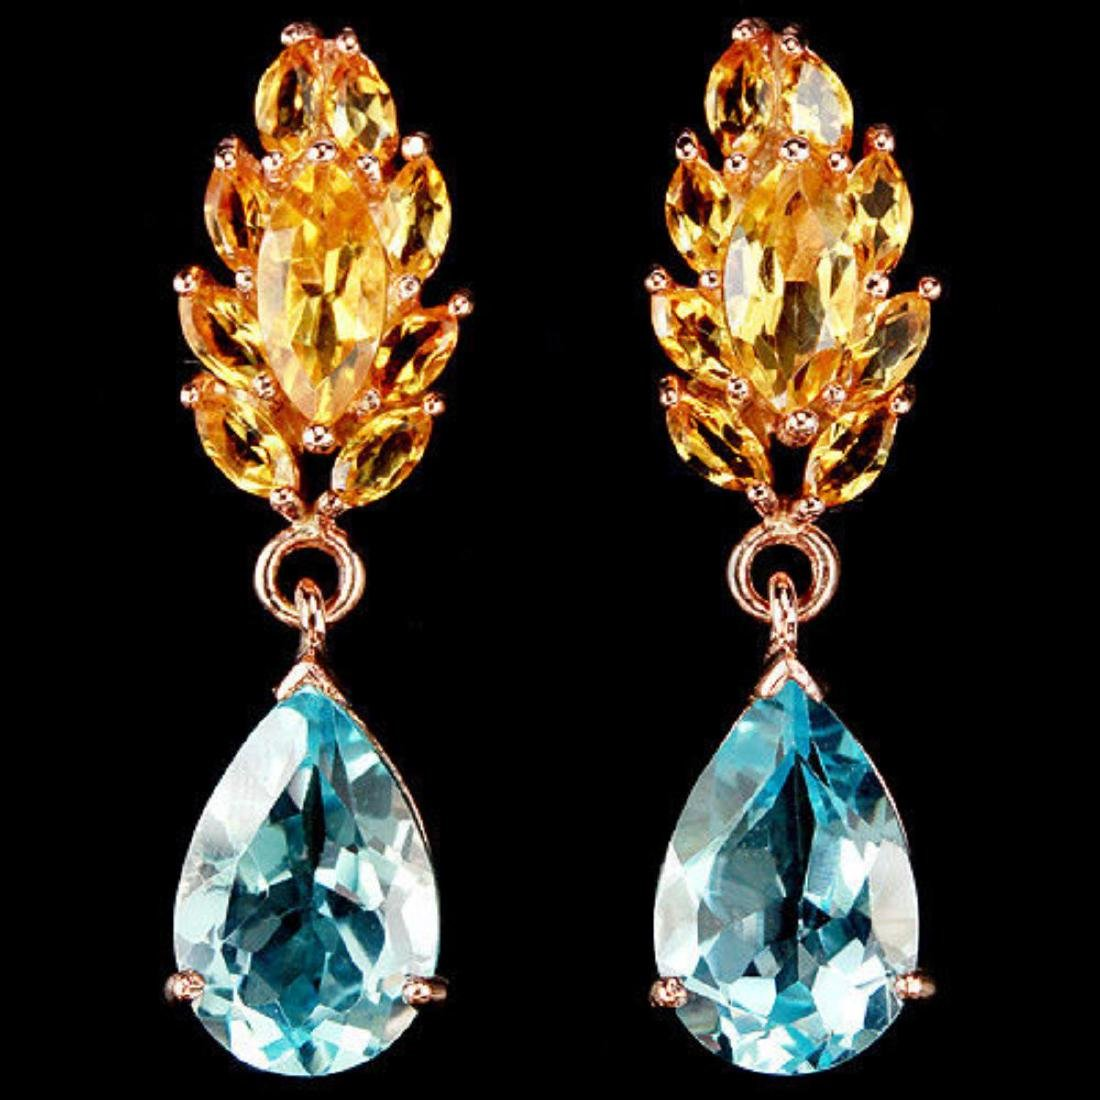 Natural SKY BLUE TOPAZ & YELLOW CITRINE Earrings